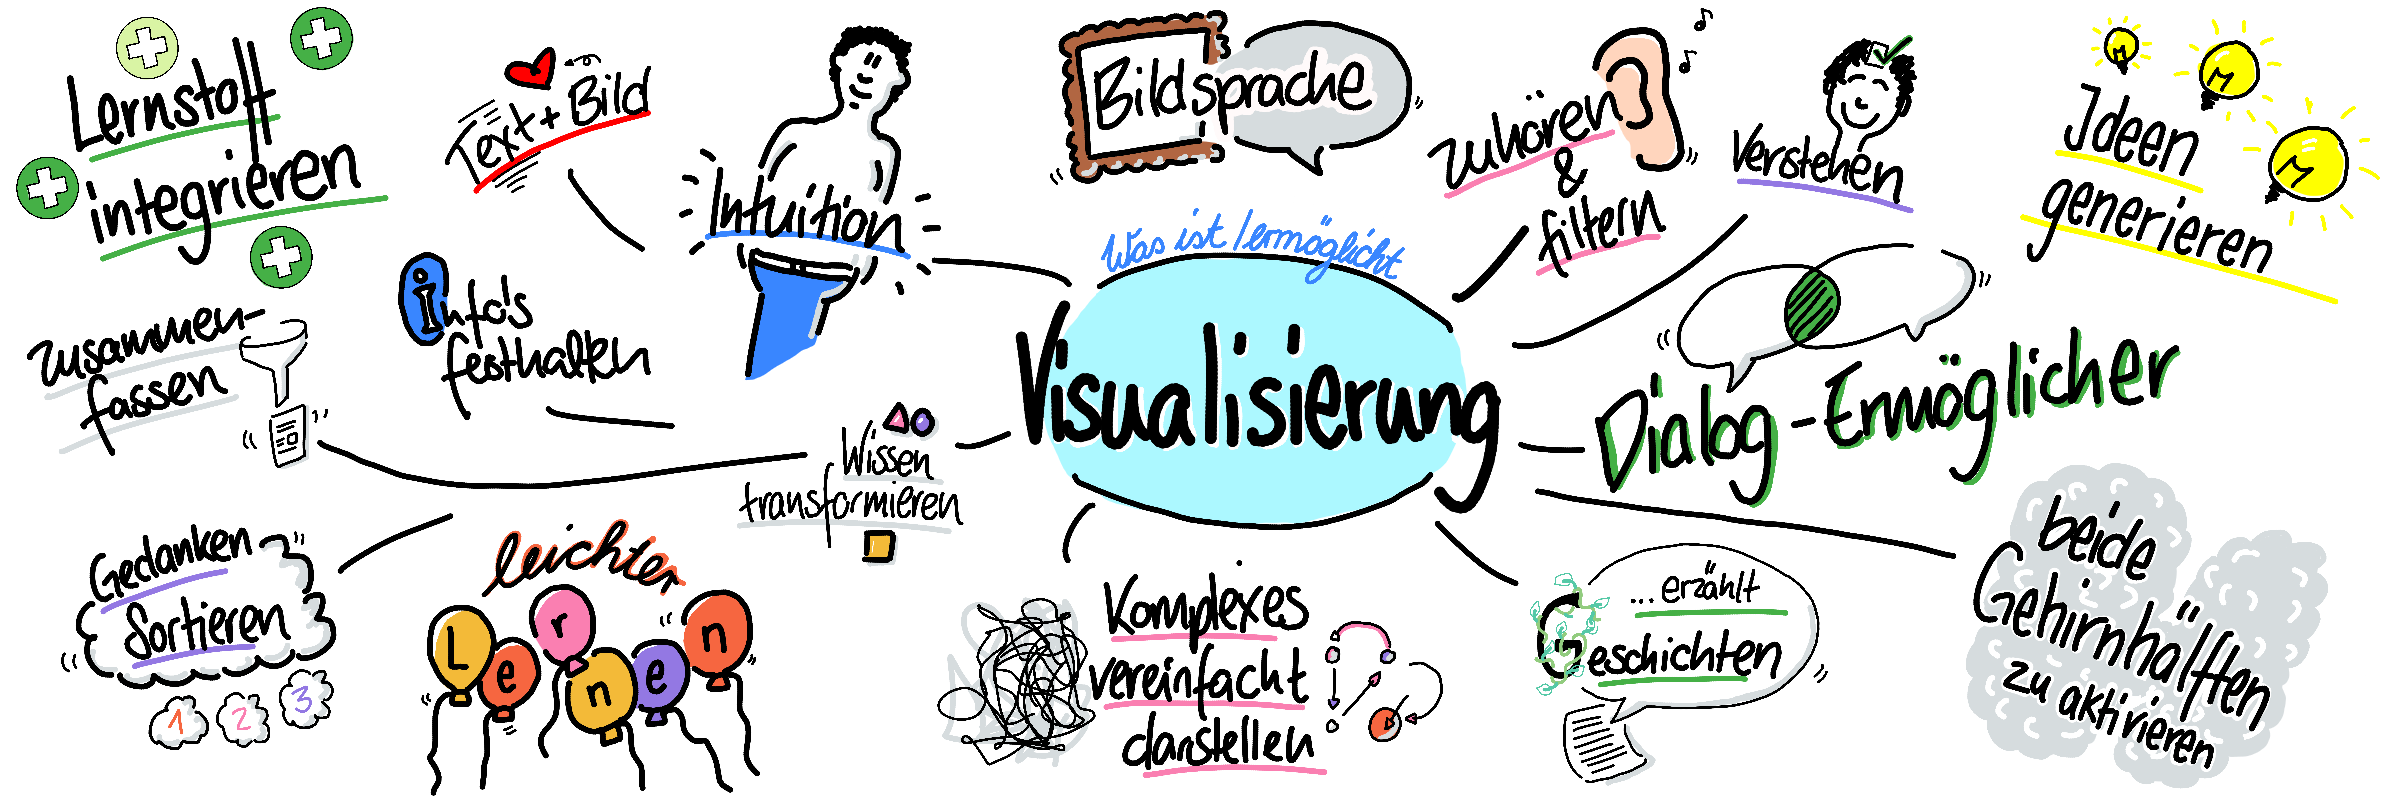 Visualisierung-MindMap-IR